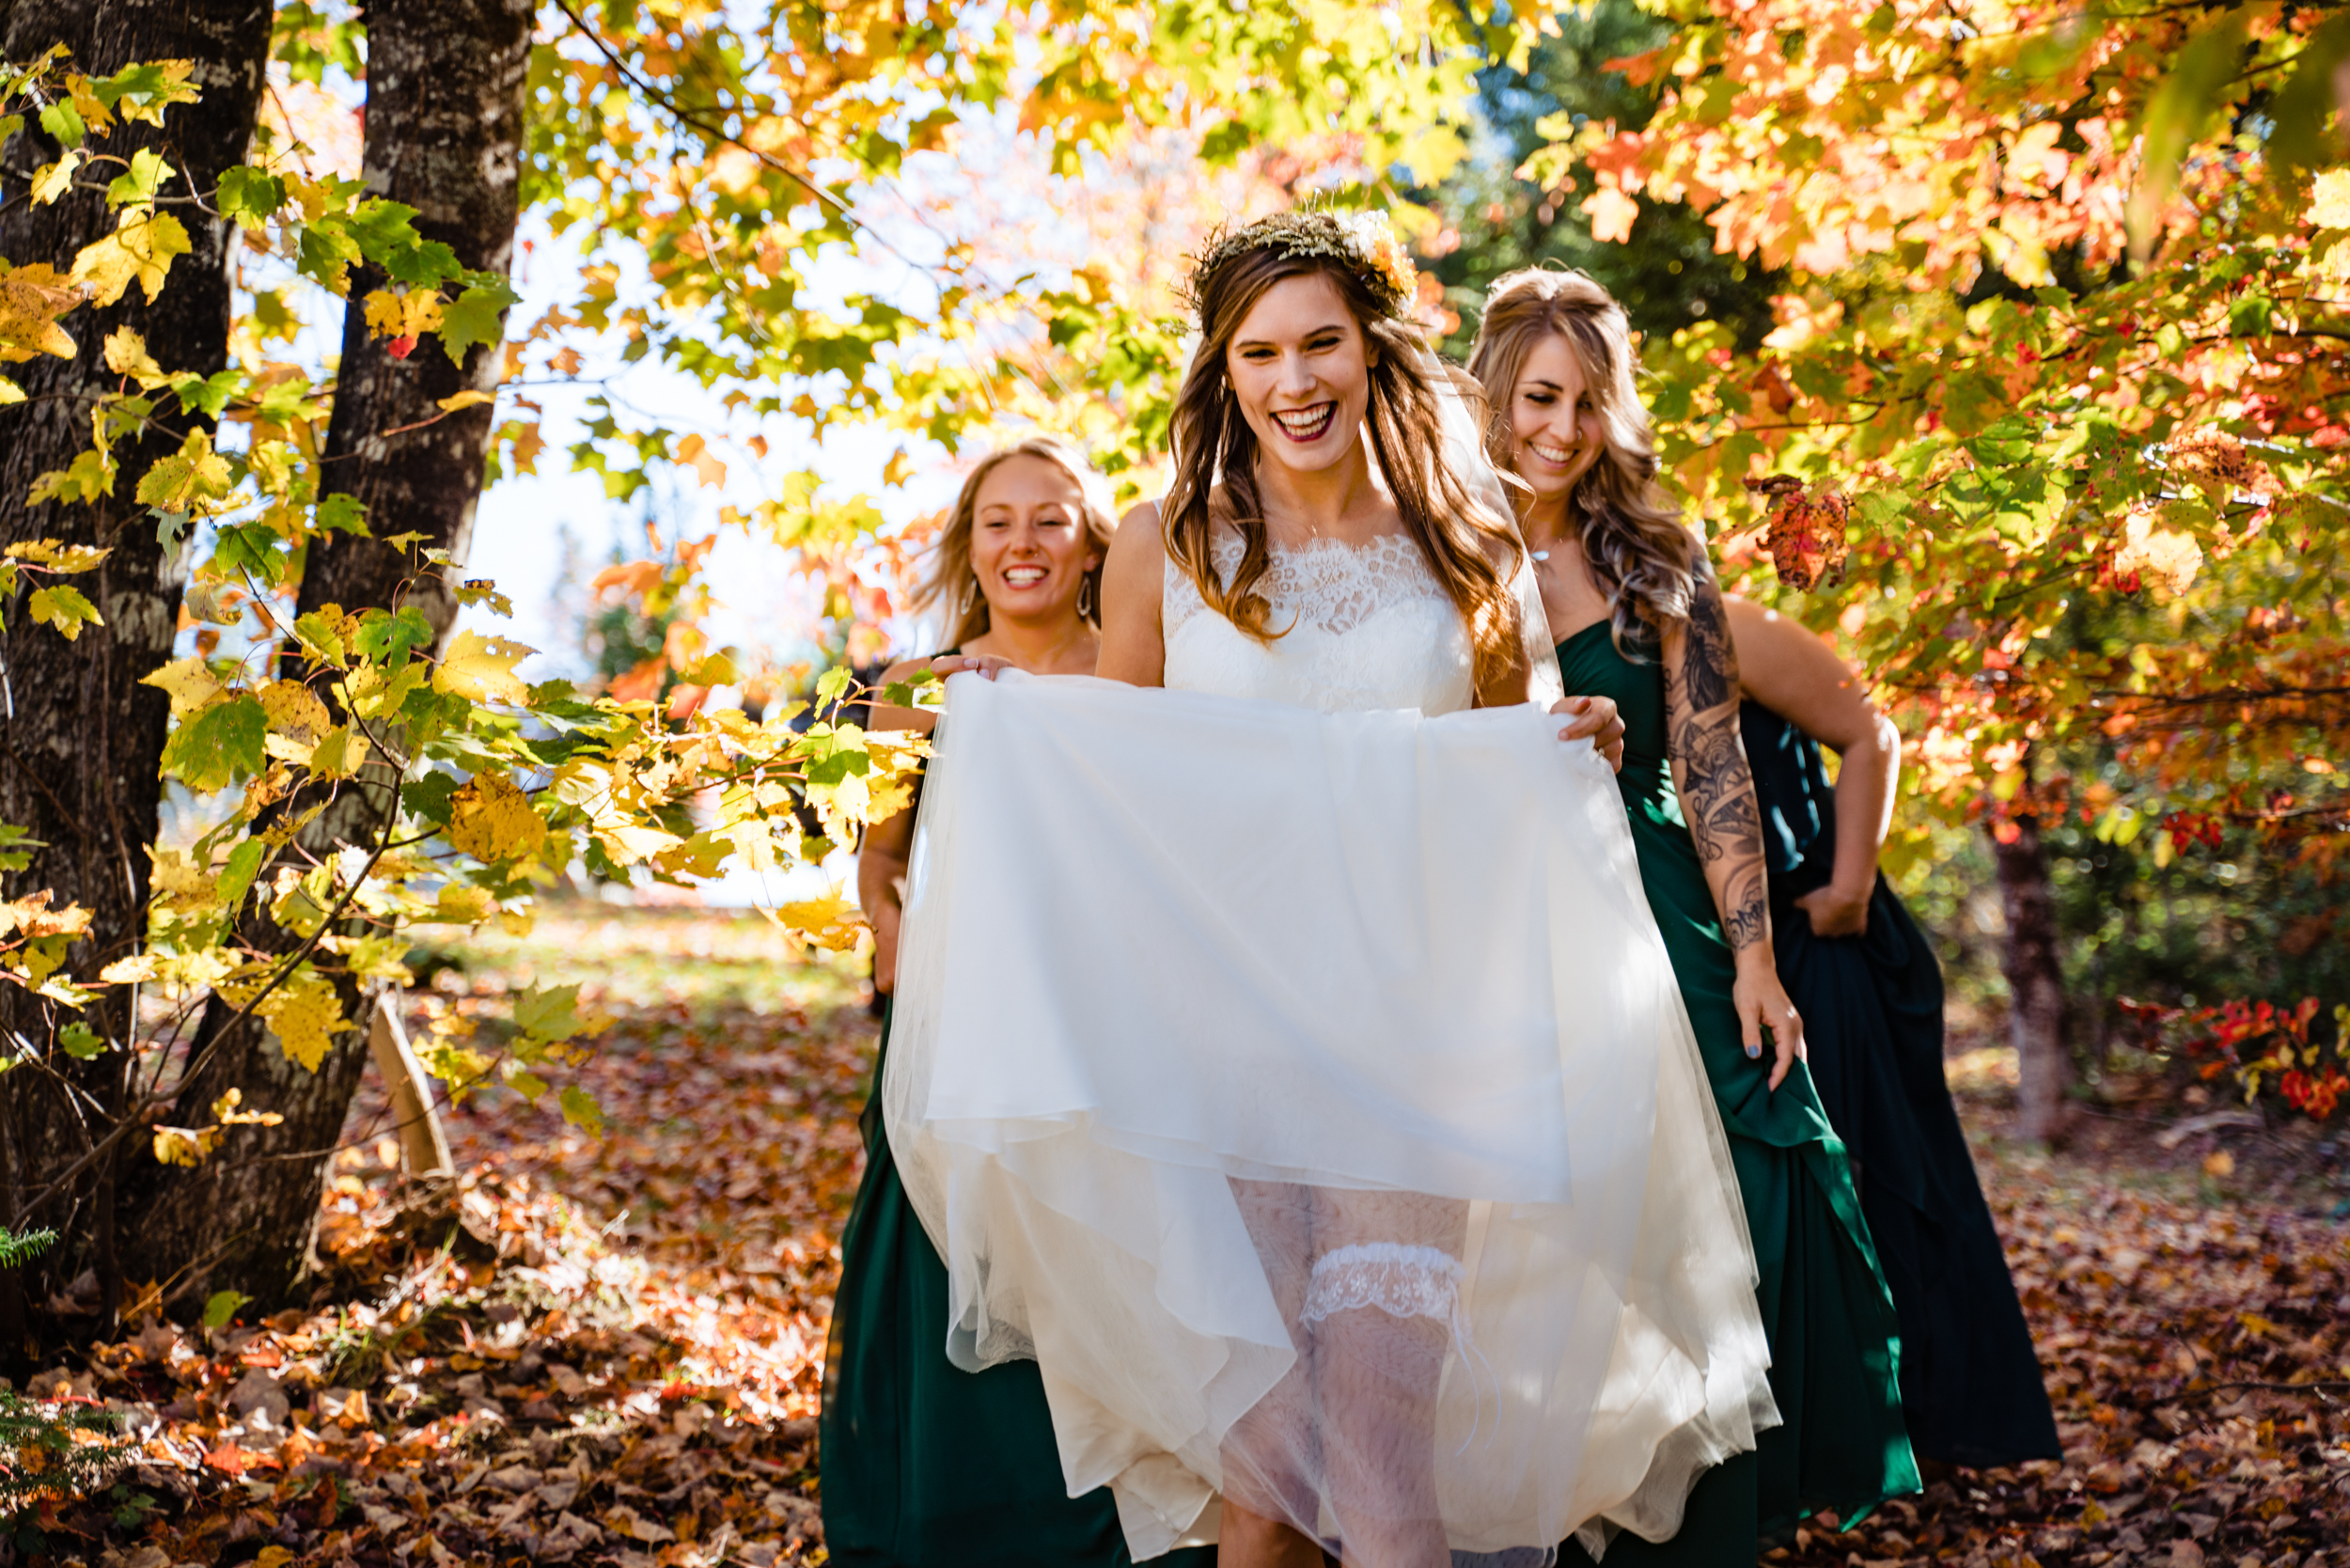 Halifax-wedding-photography-fall-photographers-novascotia-canada-ottawa (9 of 97).jpg